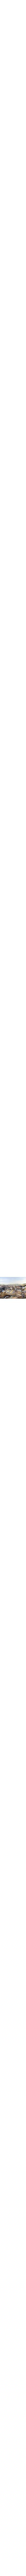 Roofs in Old Jerusalem